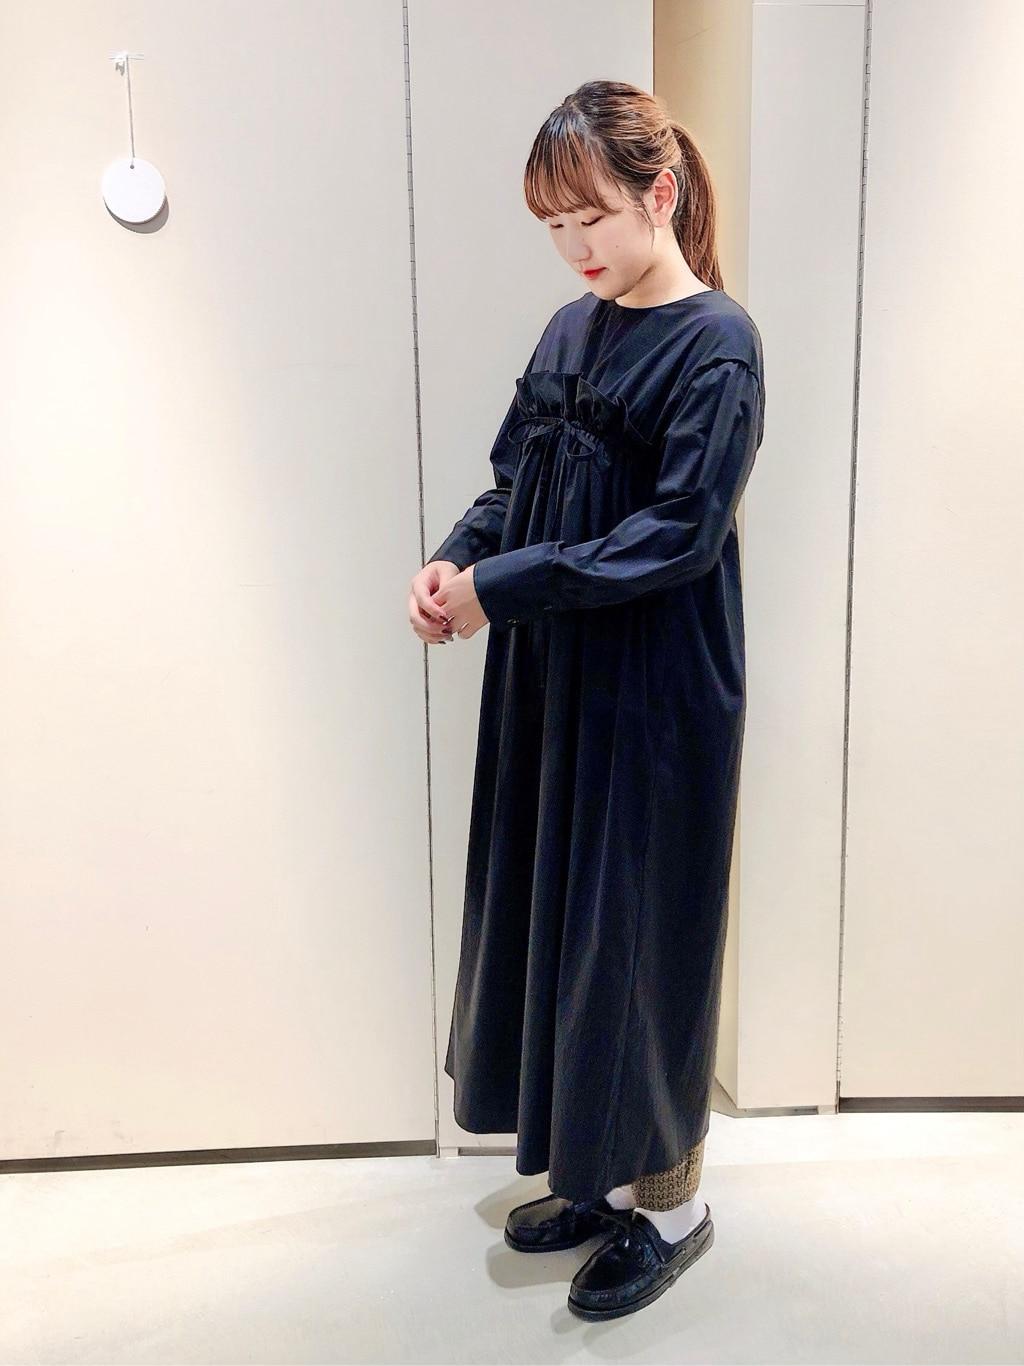 bulle de savon 阪急西宮ガーデンズ 身長:167cm 2019.10.27